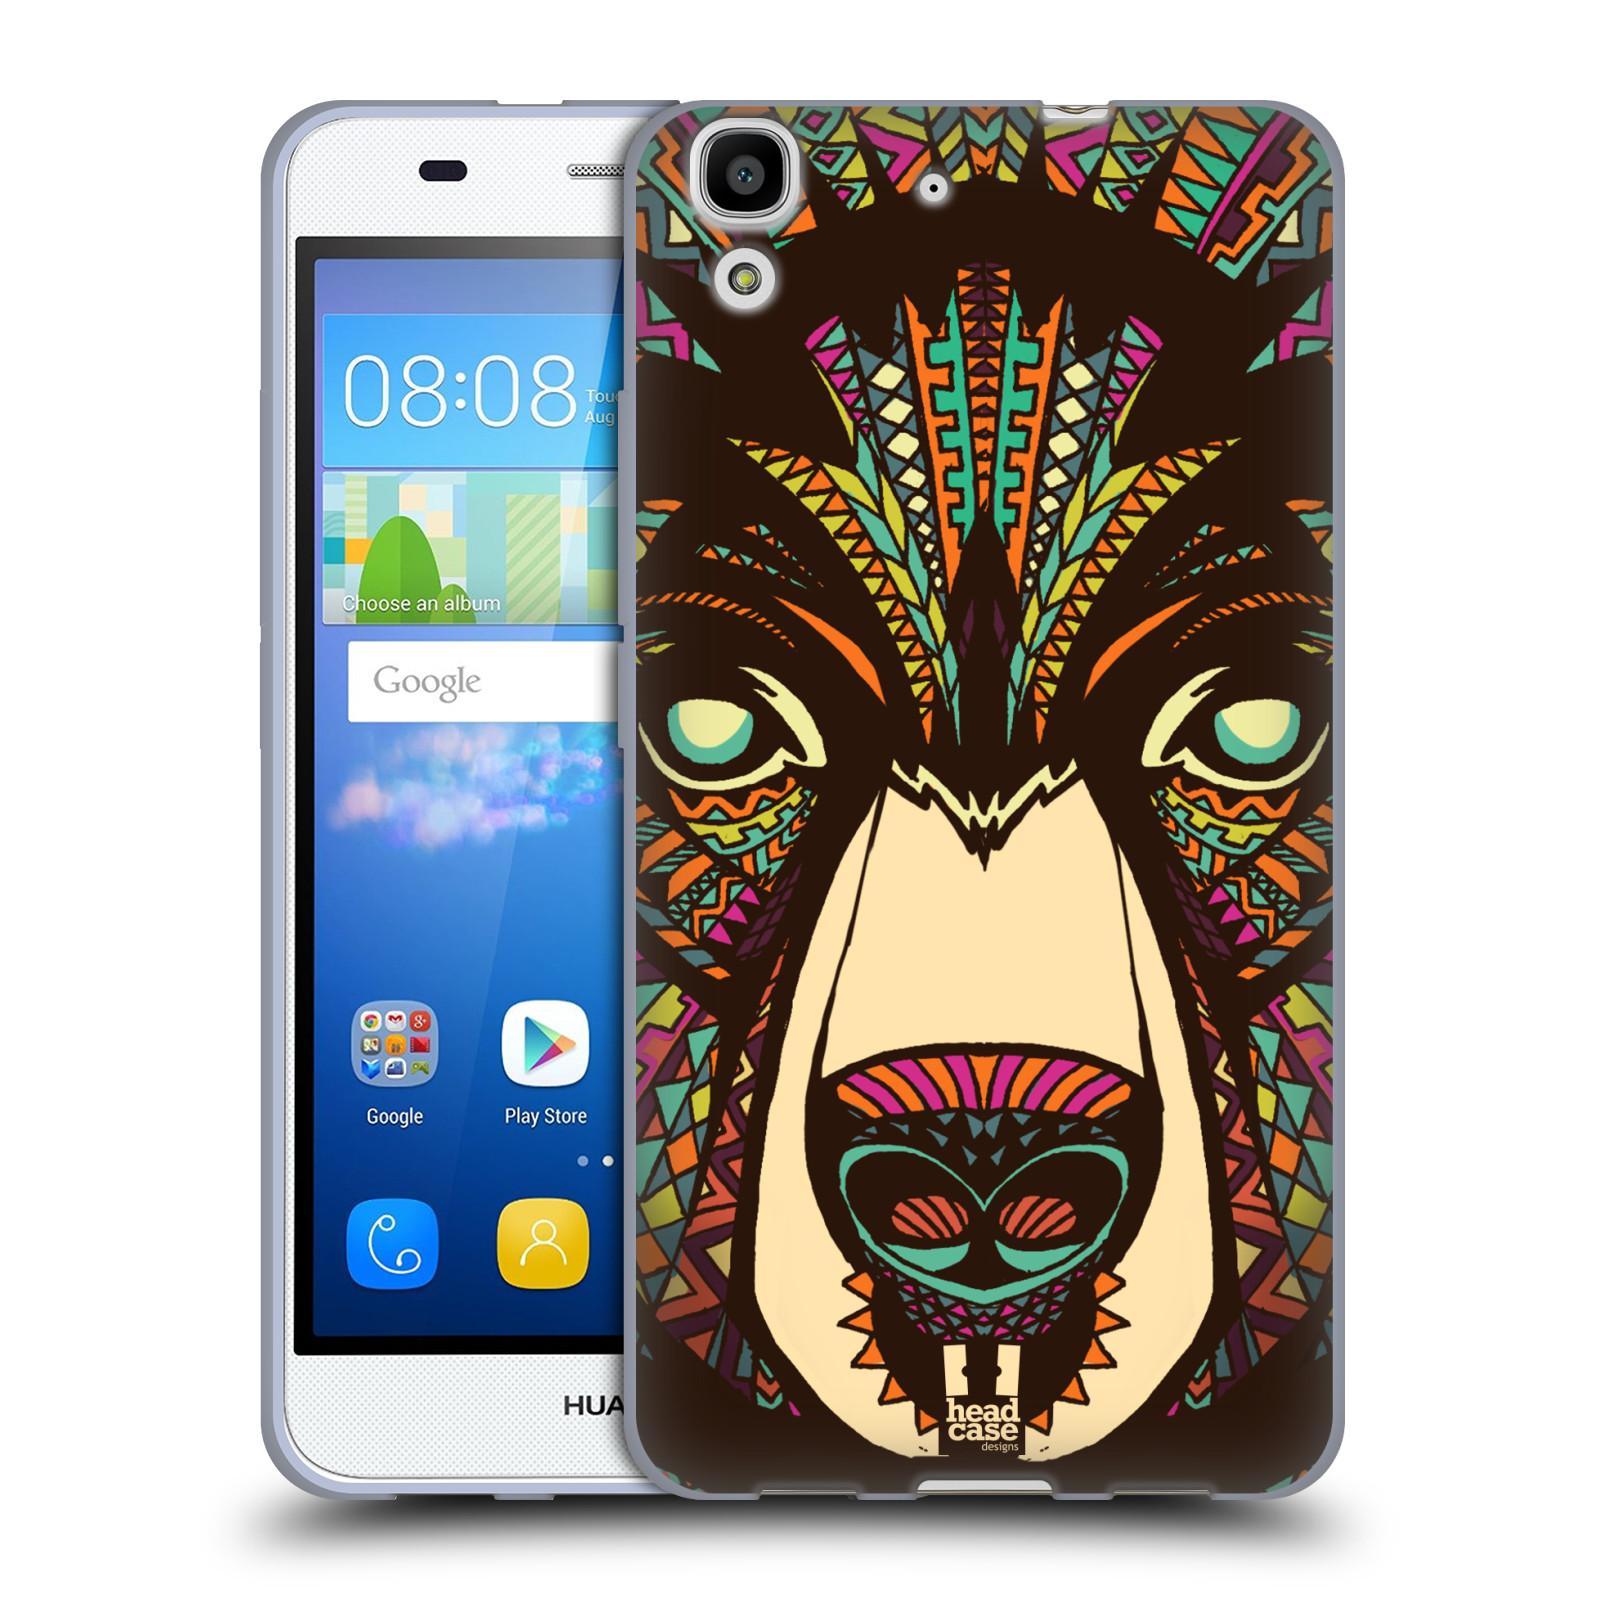 Silikonové pouzdro na mobil Huawei Y6 HEAD CASE AZTEC MEDVĚD